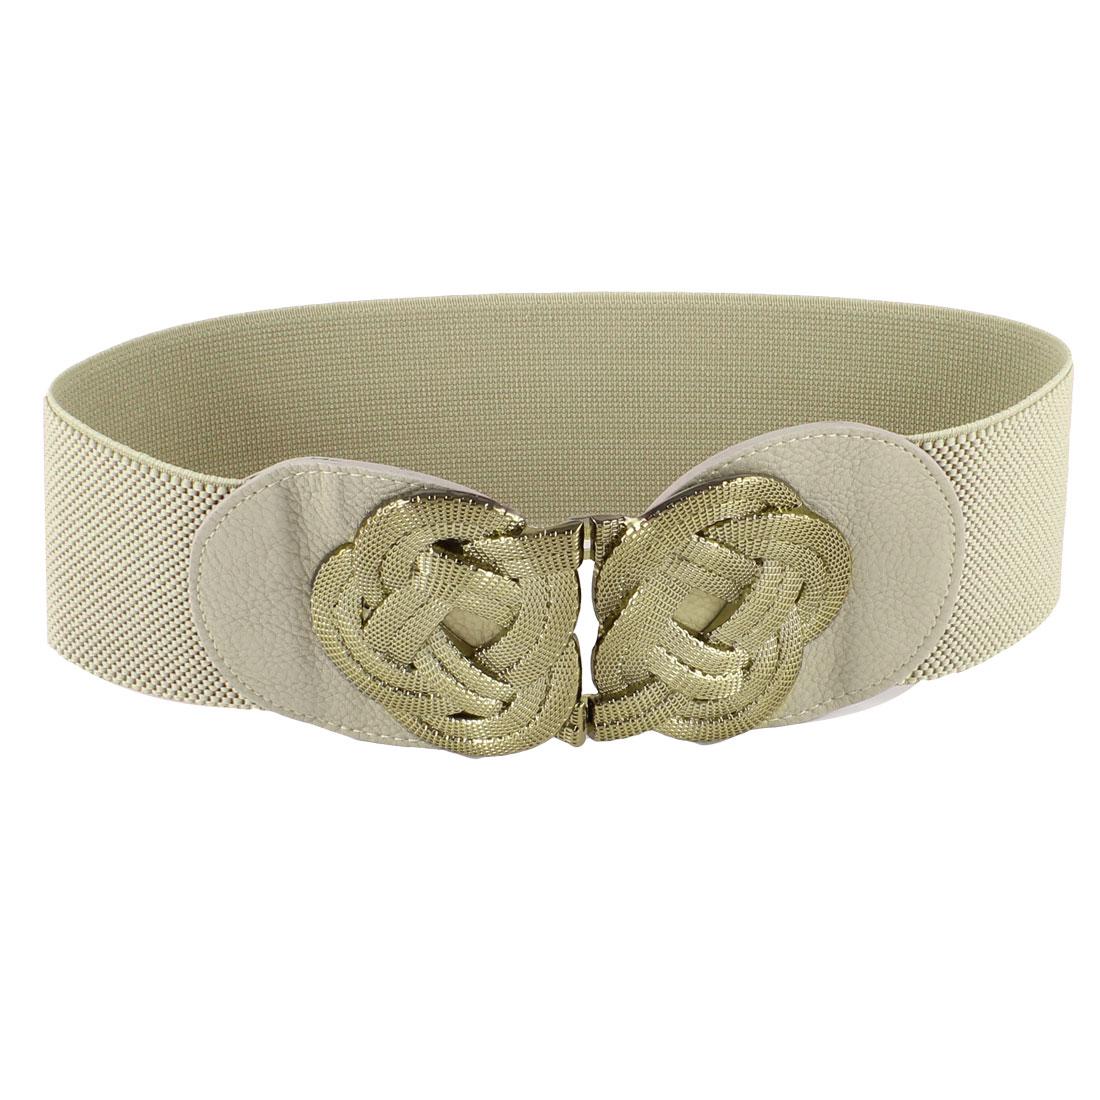 Ladies Gold Tone Metal Flower Knot Hook Buckle Khaki Elastic Waist Band Belt